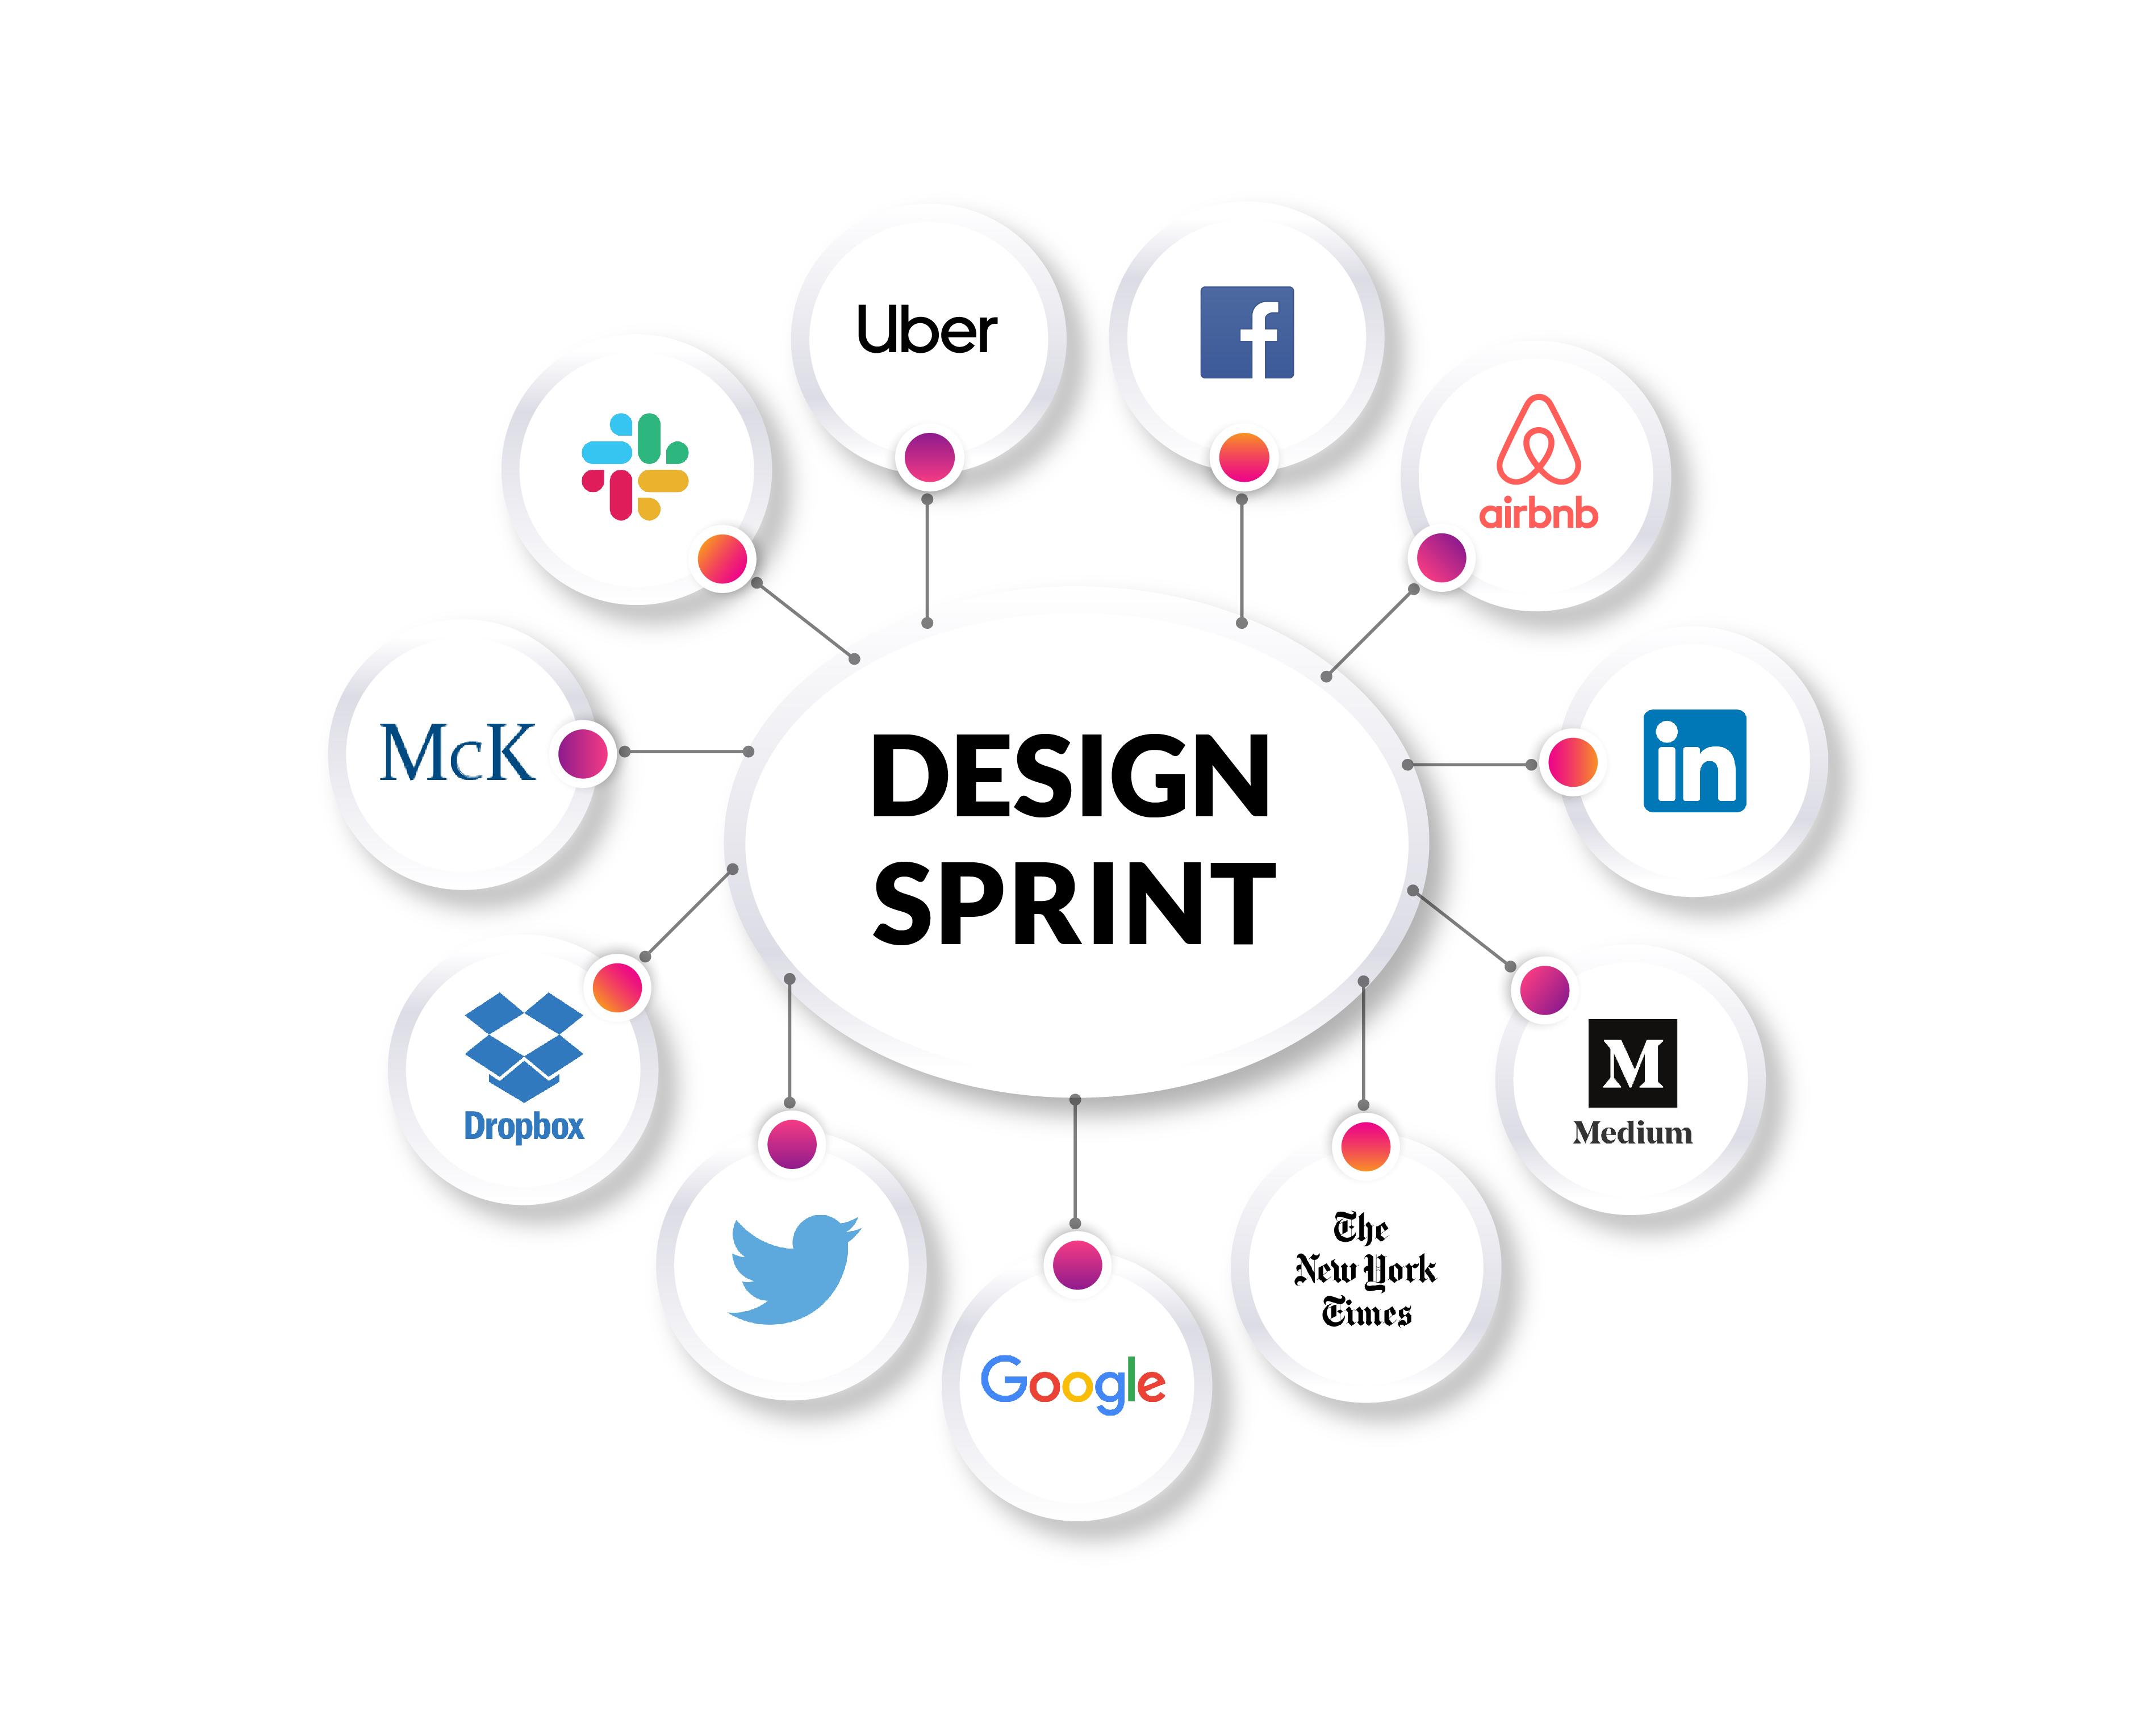 Companies that use design sprints